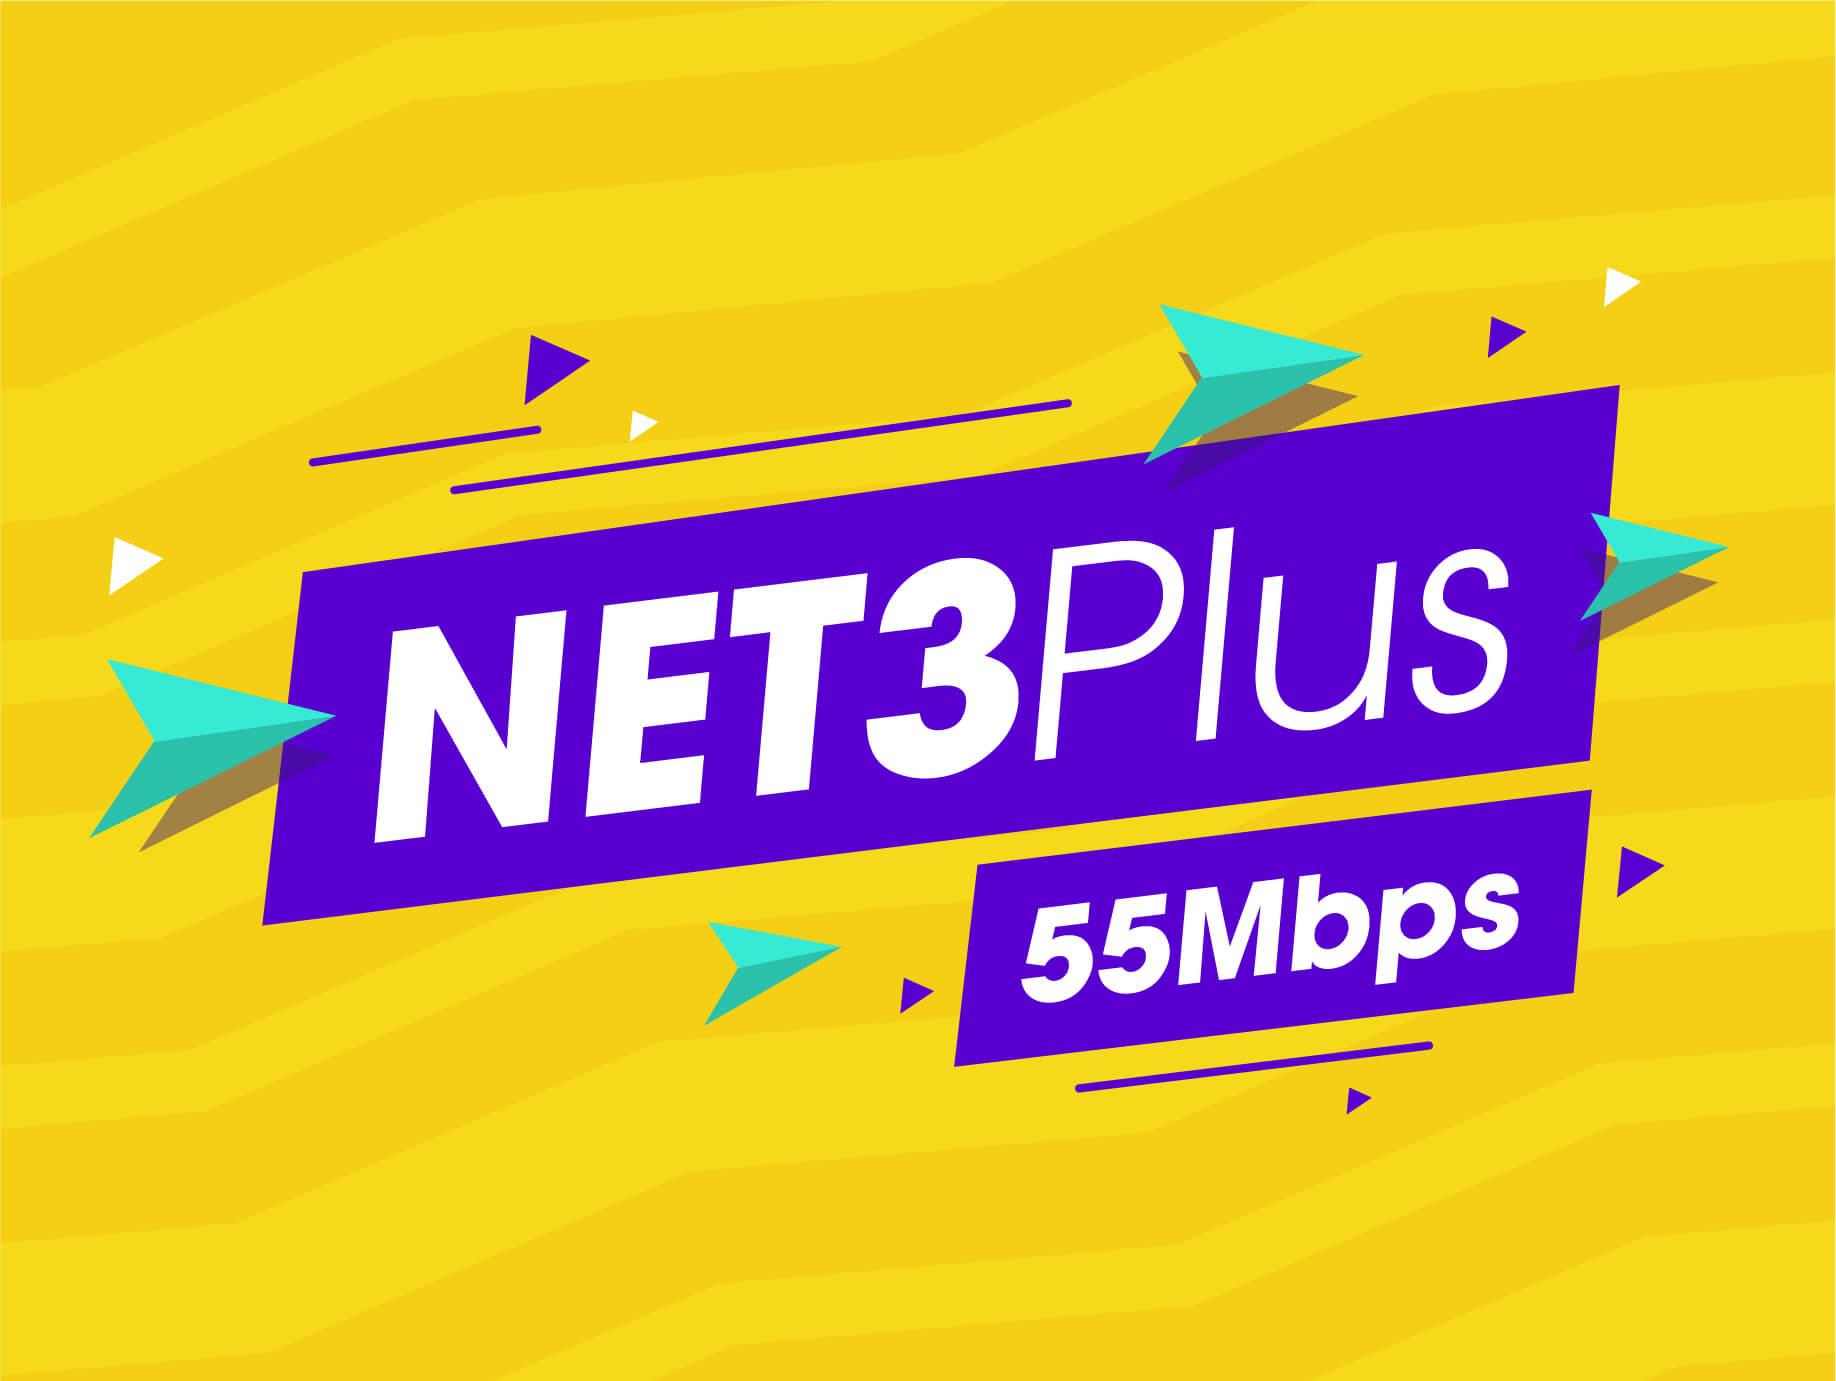 gói cước internet Viettel NET 3 PLUS